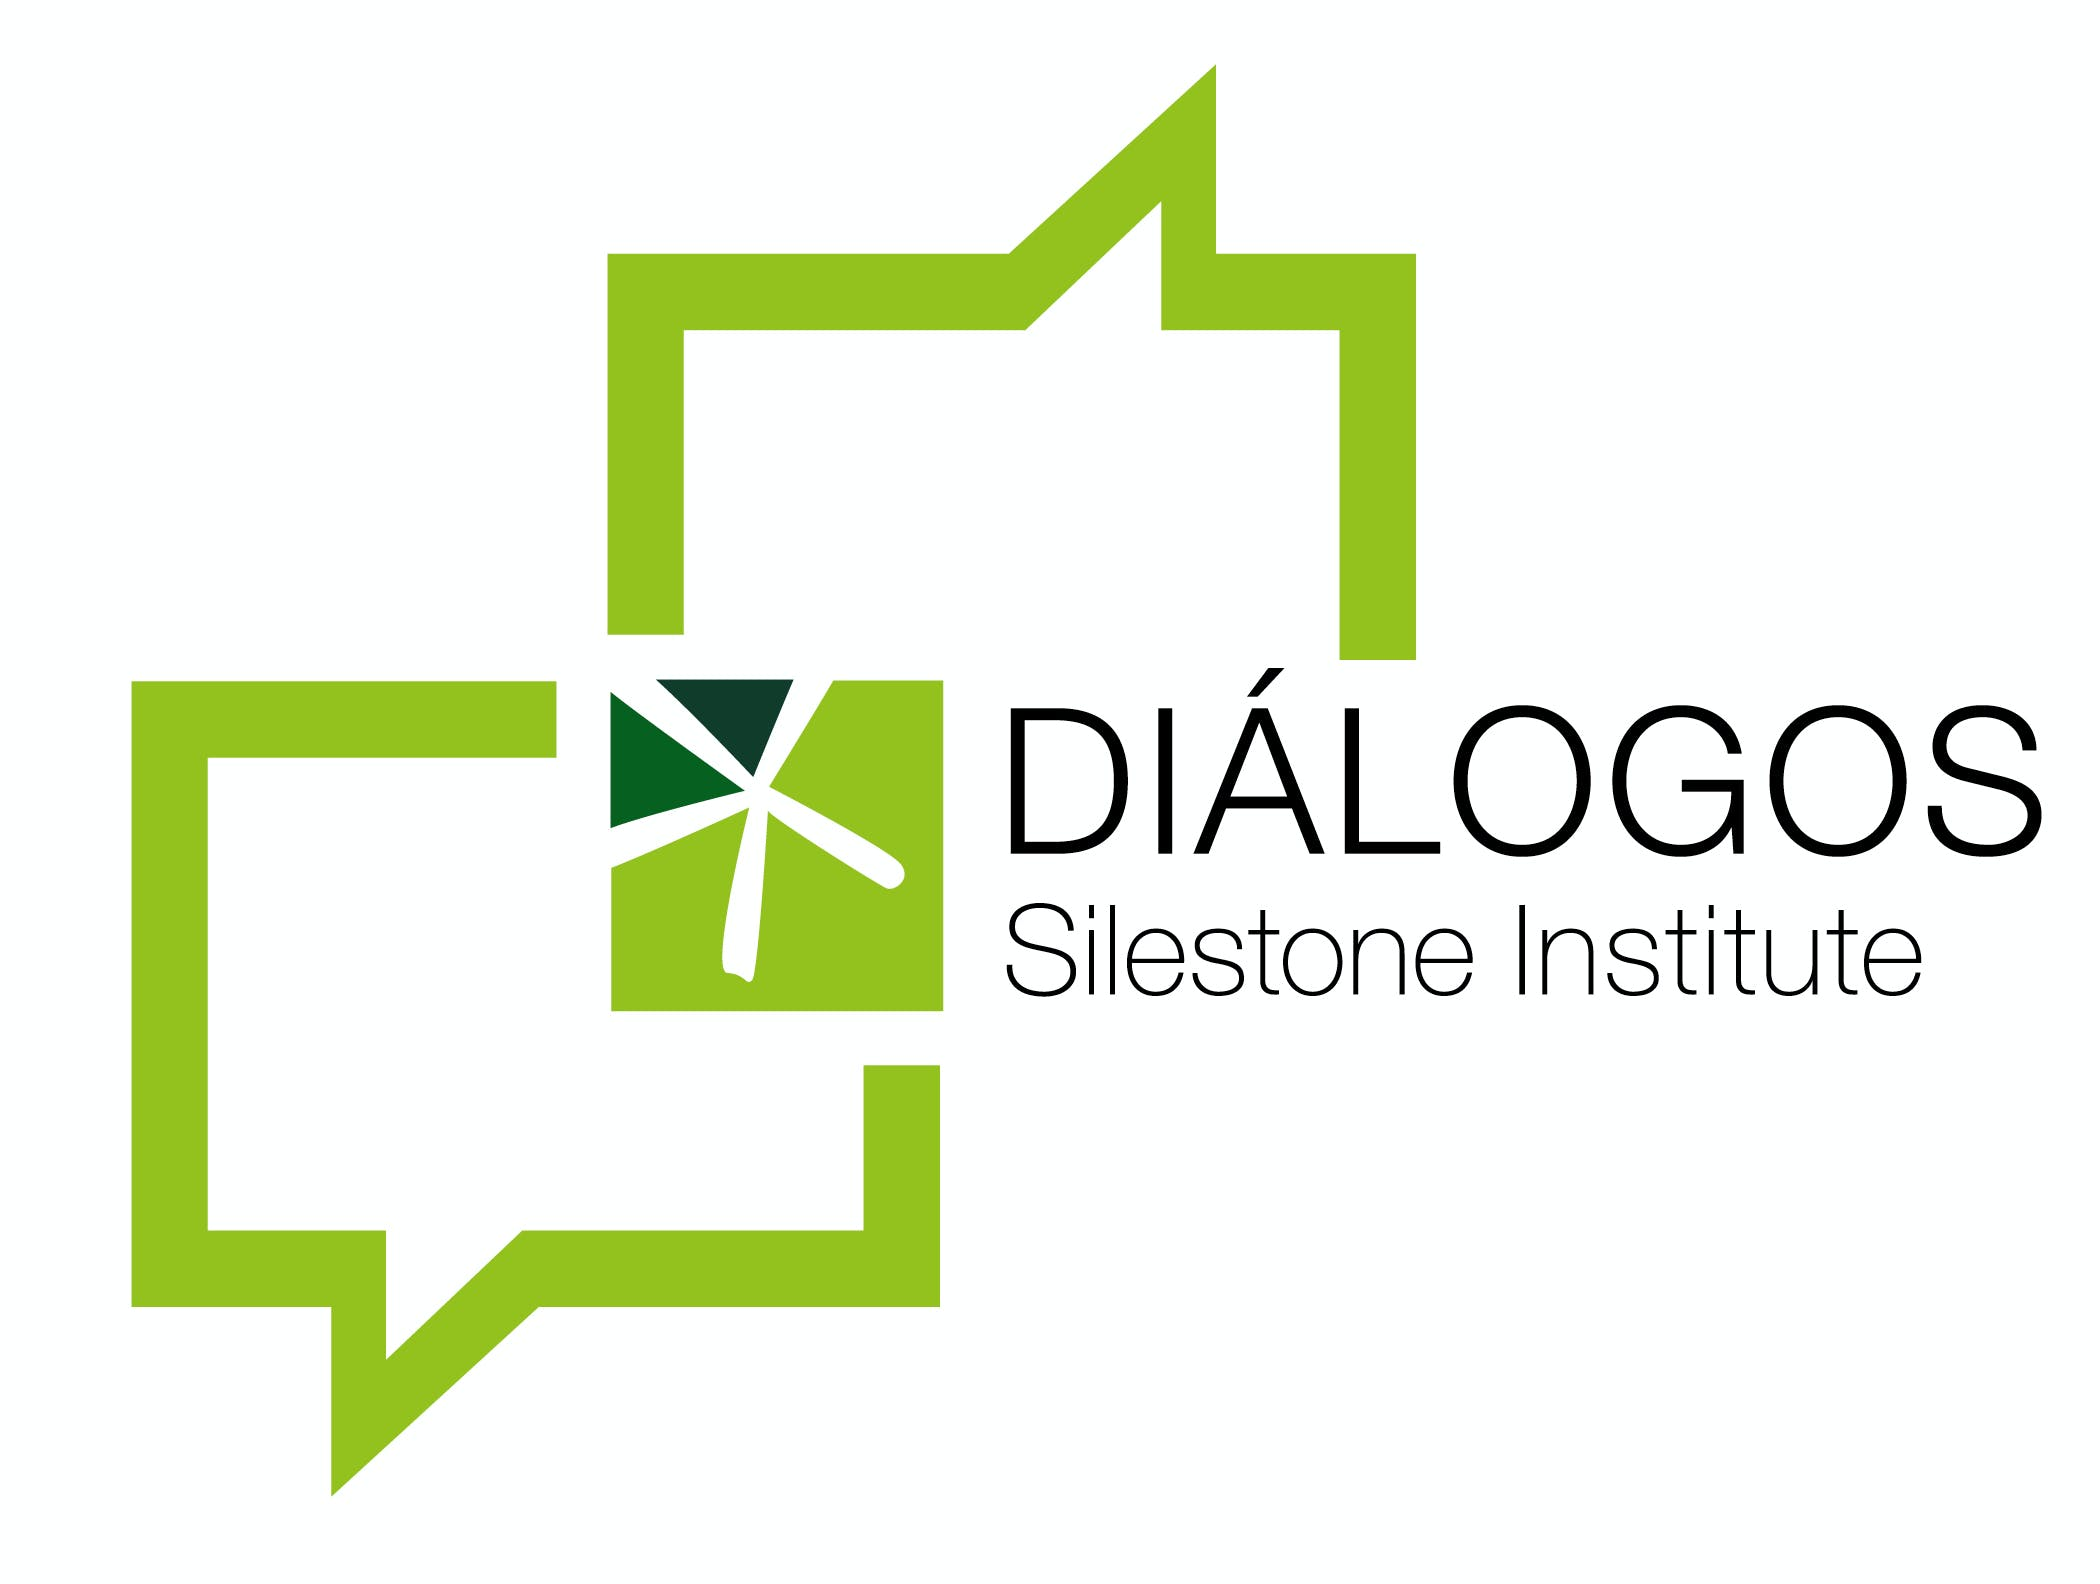 Image of DialogInstSilestone 1 in Cosentino sponsors the Madrid Design Festival 2019 - Cosentino